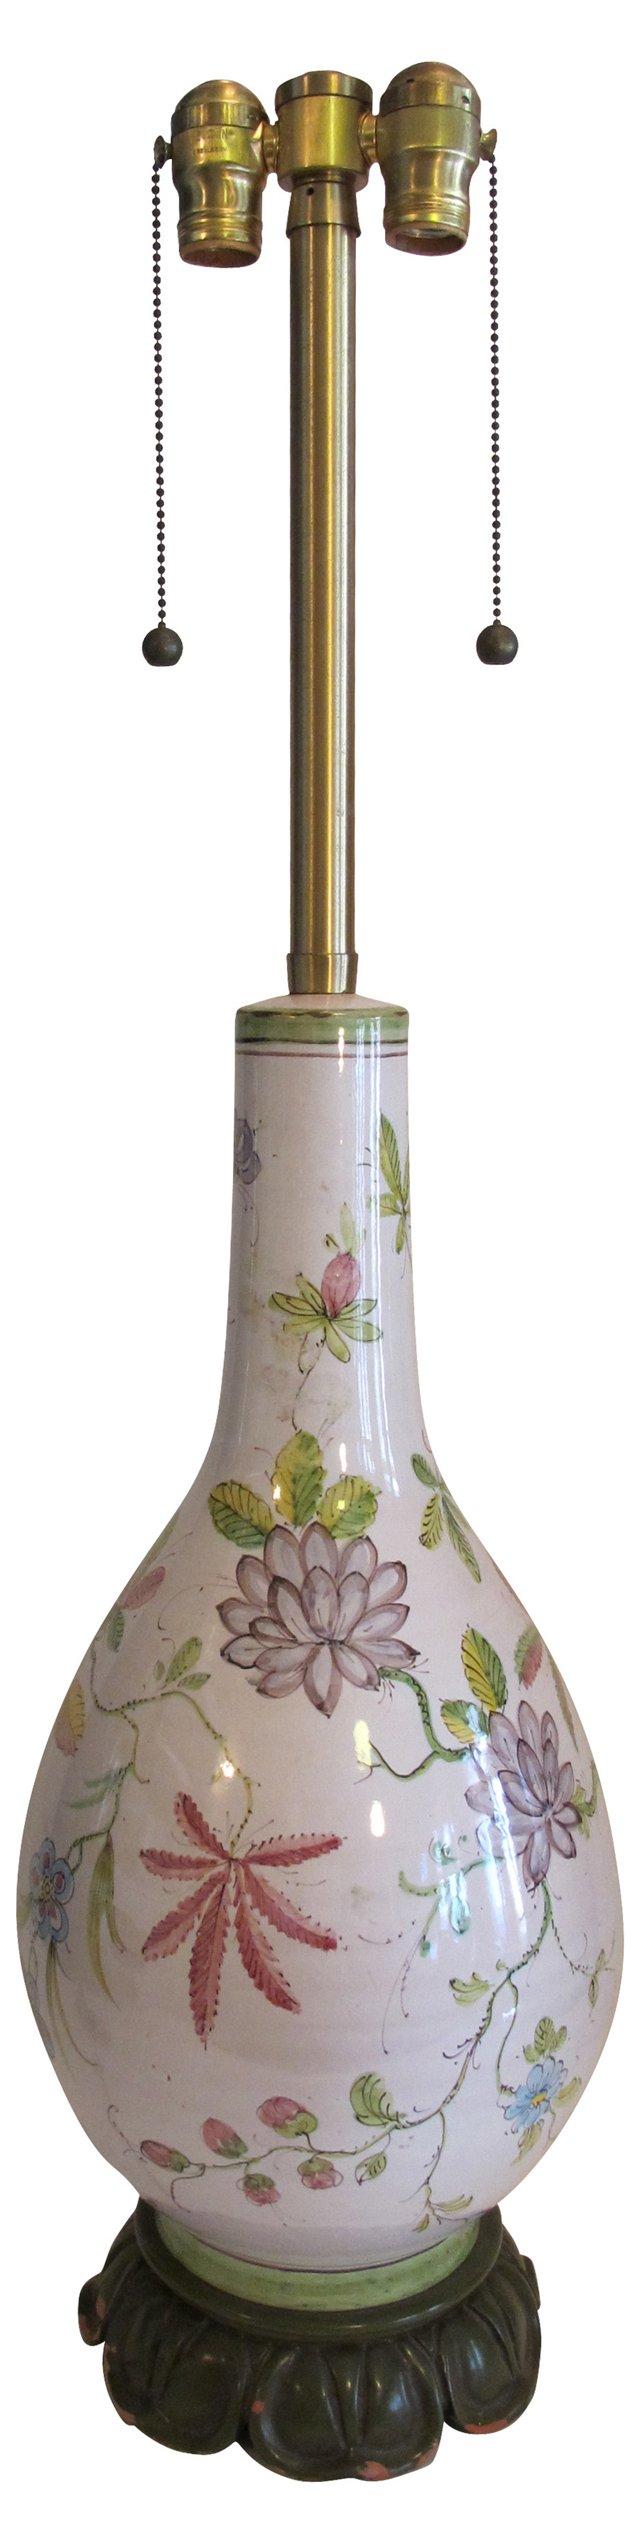 Hand-Painted Marbro Lamp